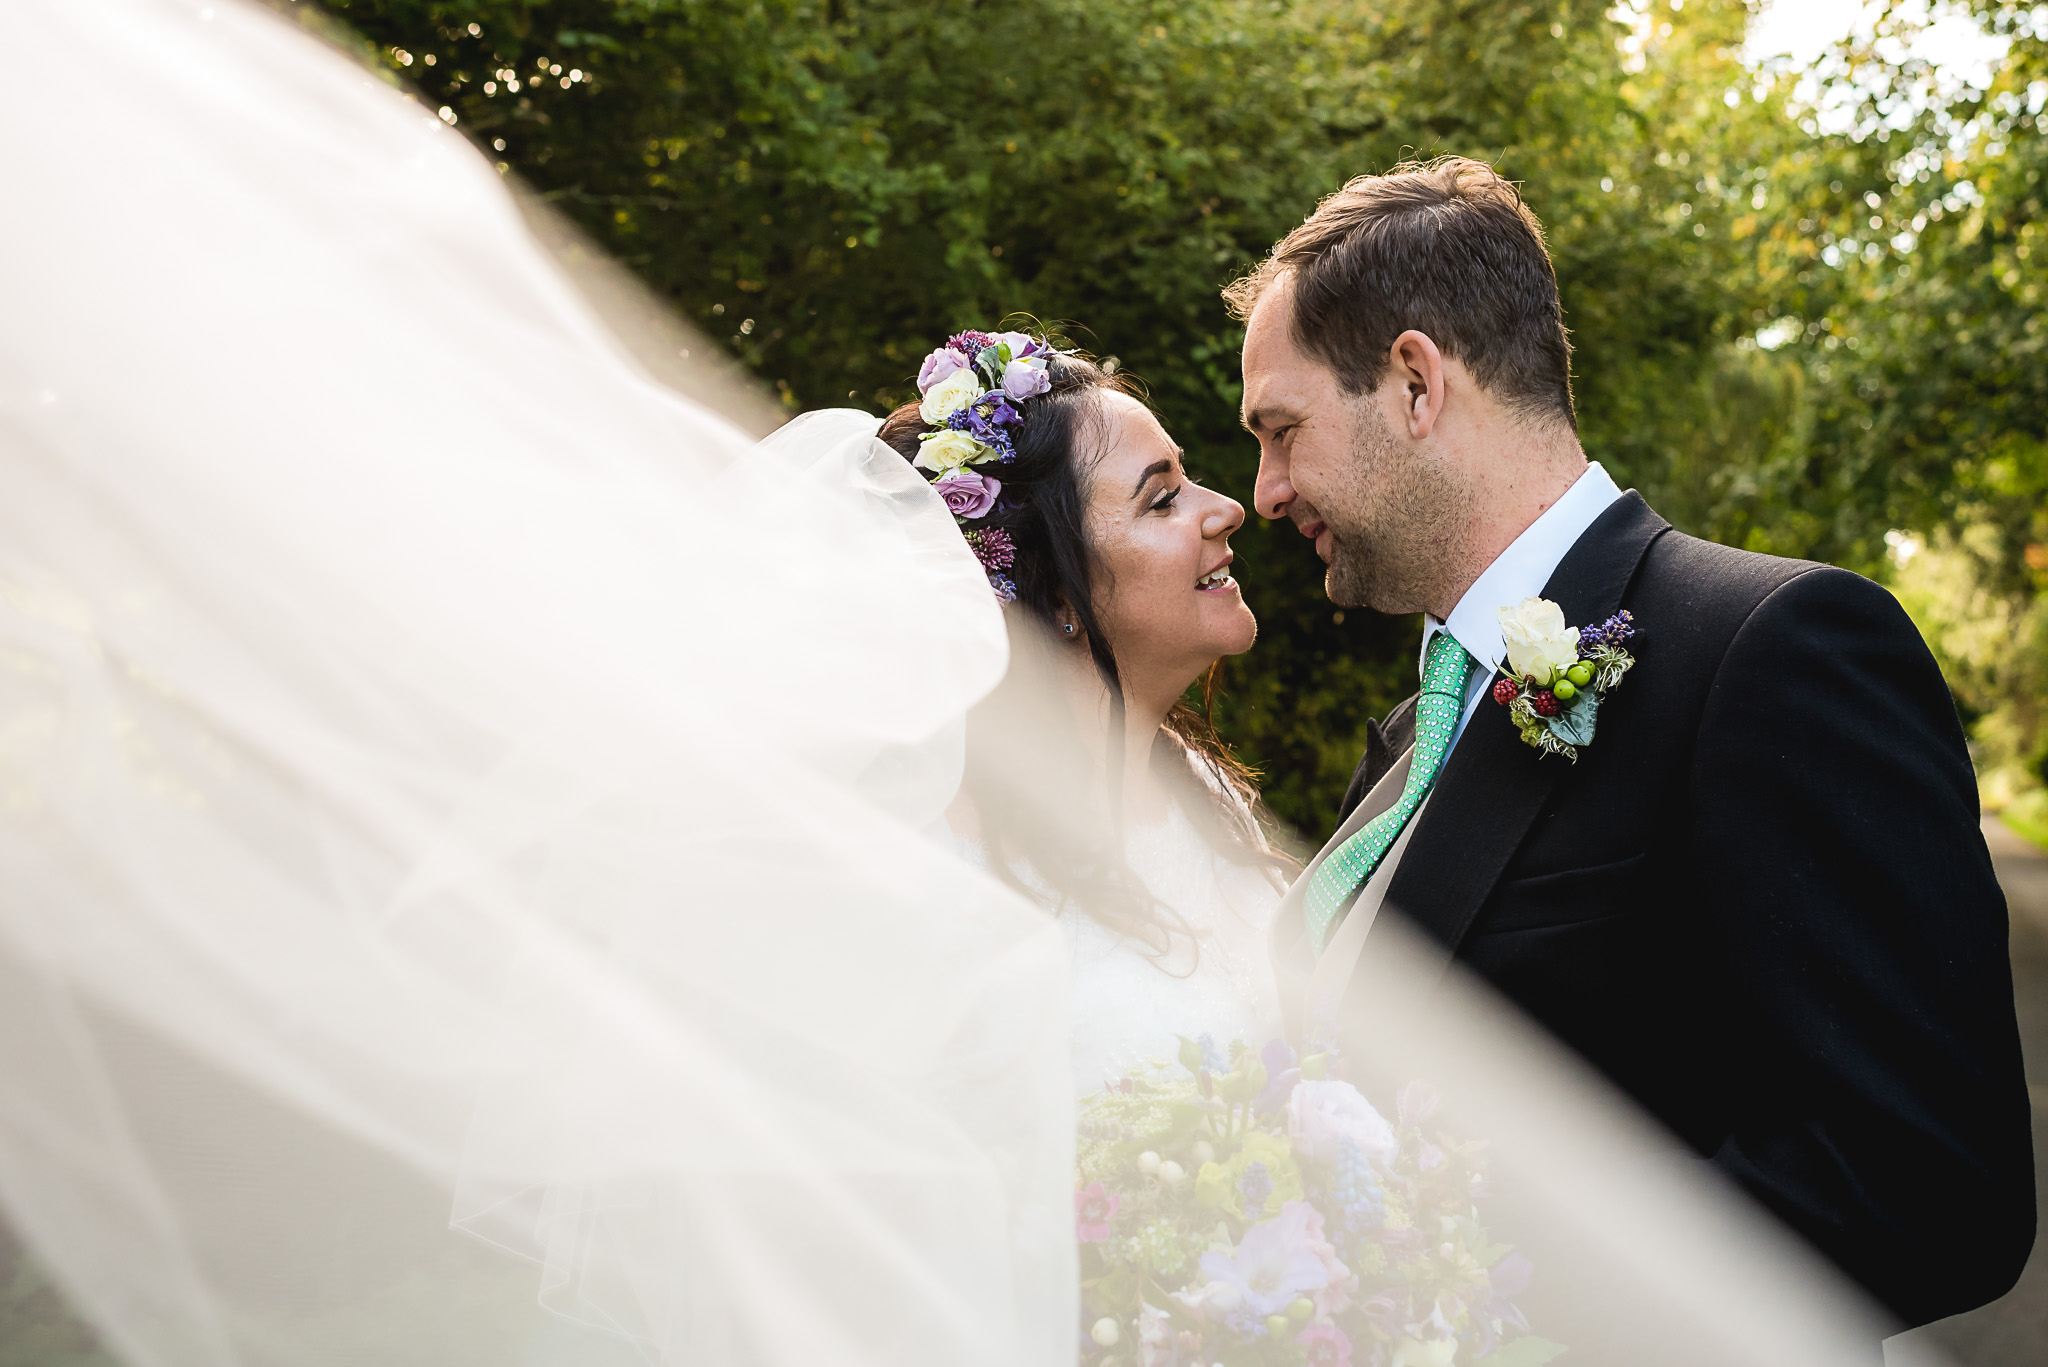 Rosie & Kristian's Barnwell wedding